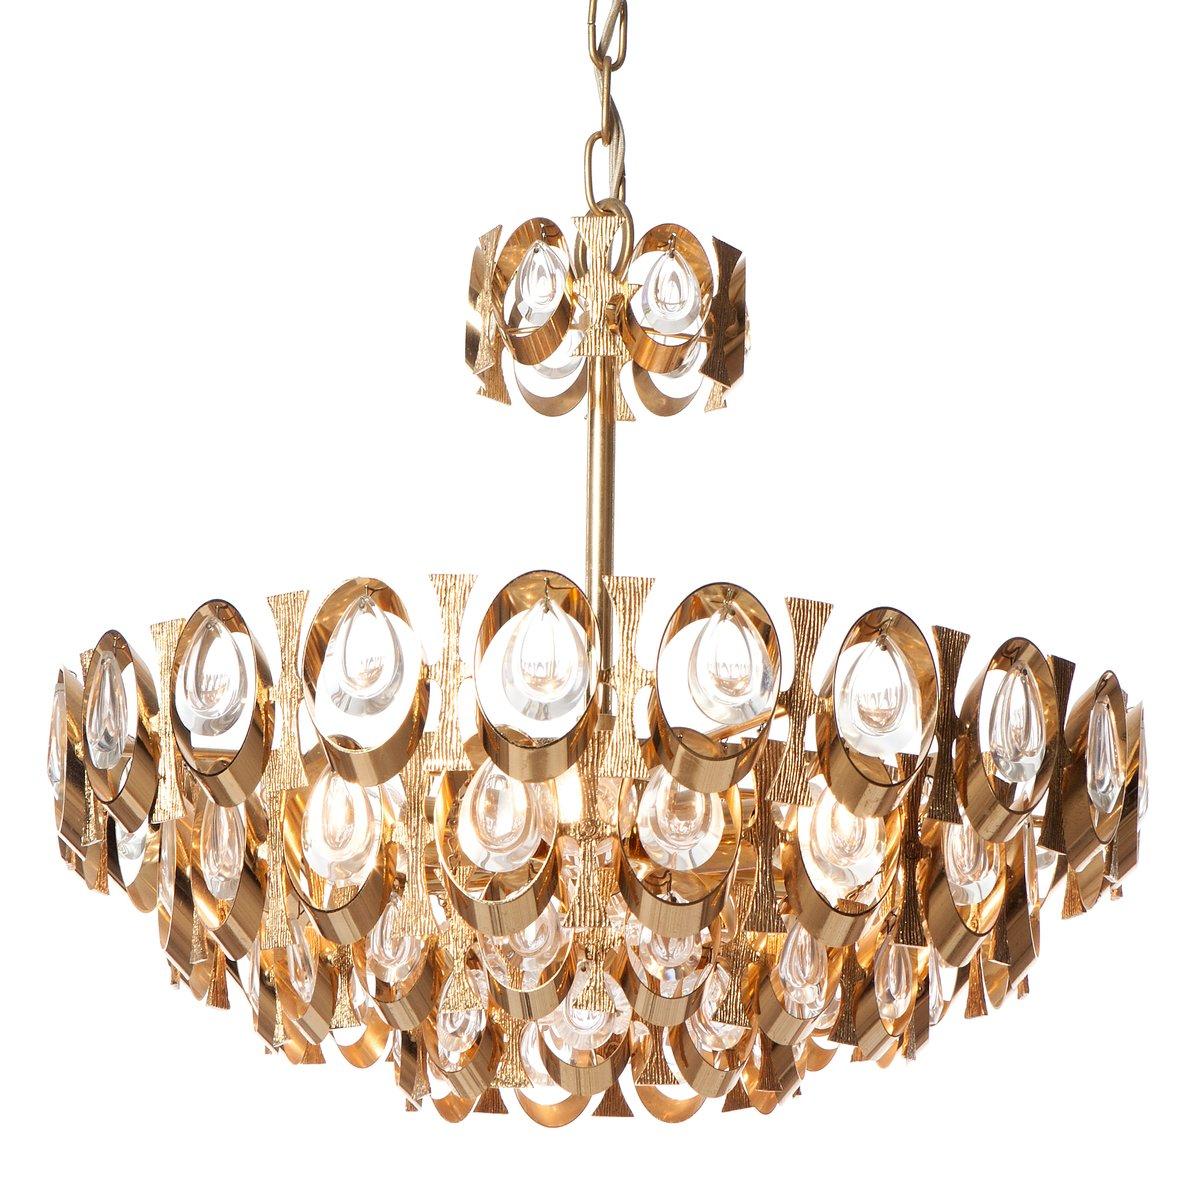 Six light crystal glass and gilt brass chandelier by sciolari for six light crystal glass and gilt brass chandelier by sciolari for palwa arubaitofo Choice Image